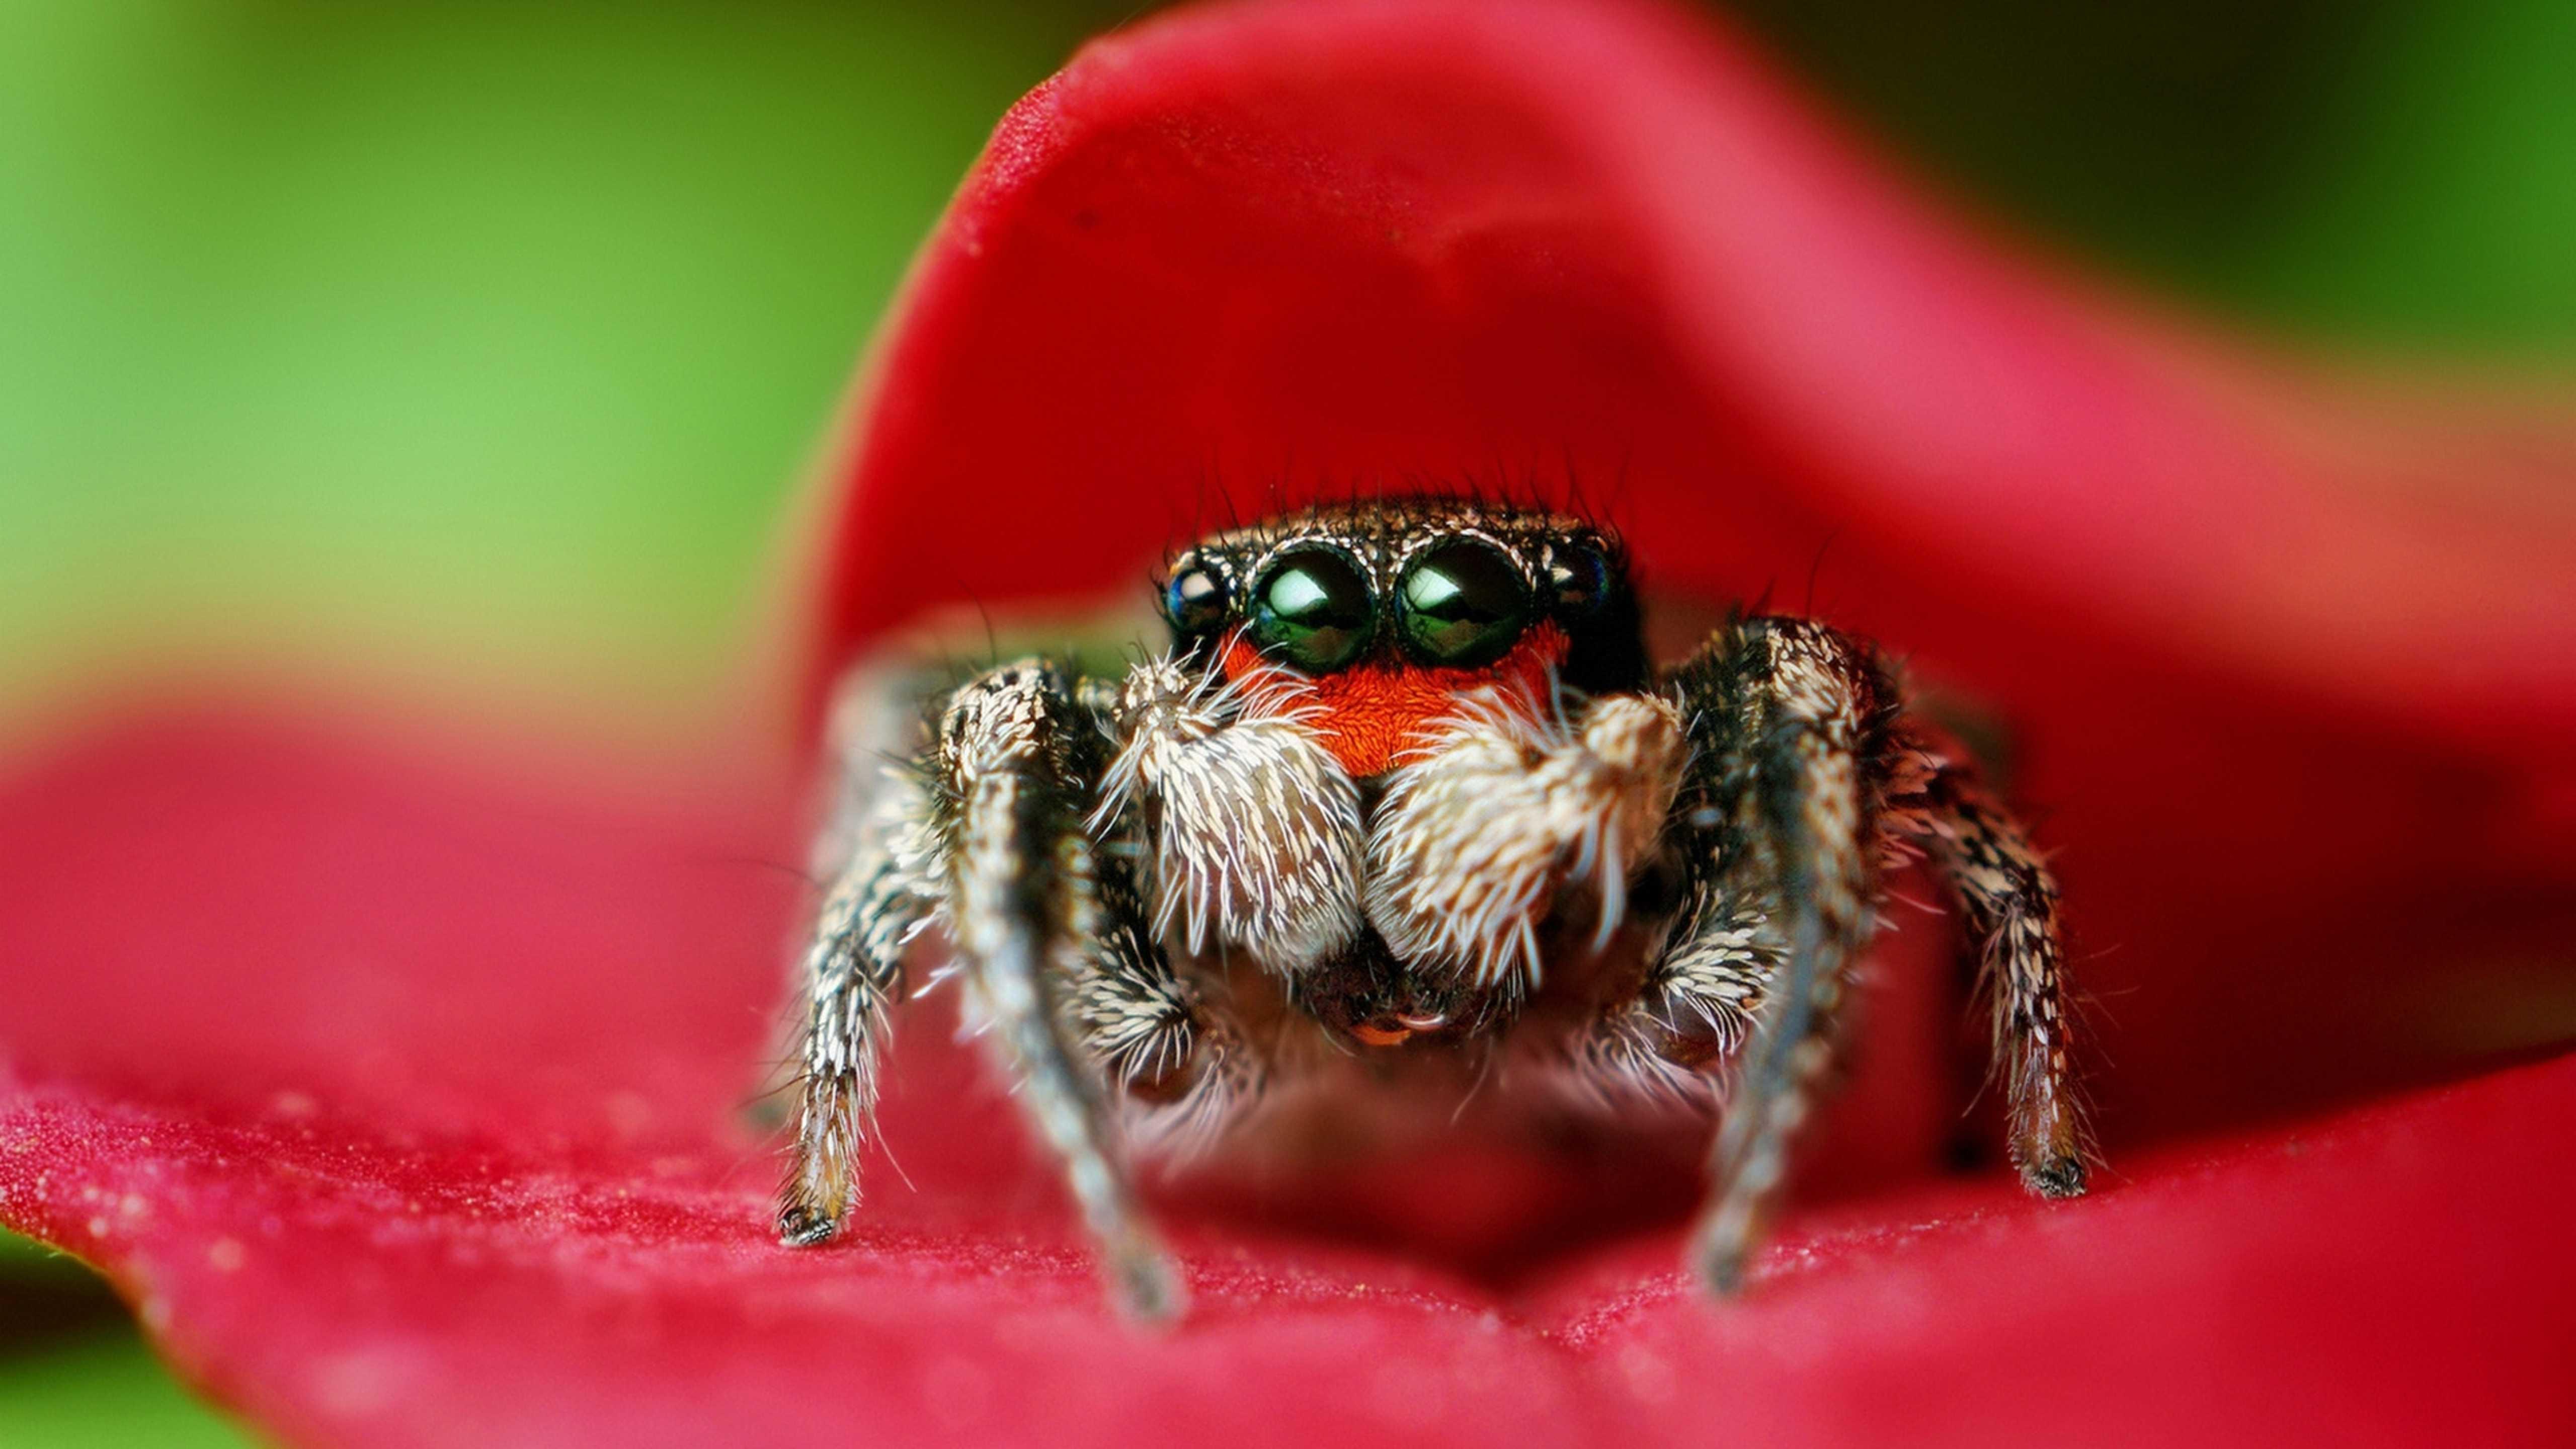 Image: Spider, close-up, macro